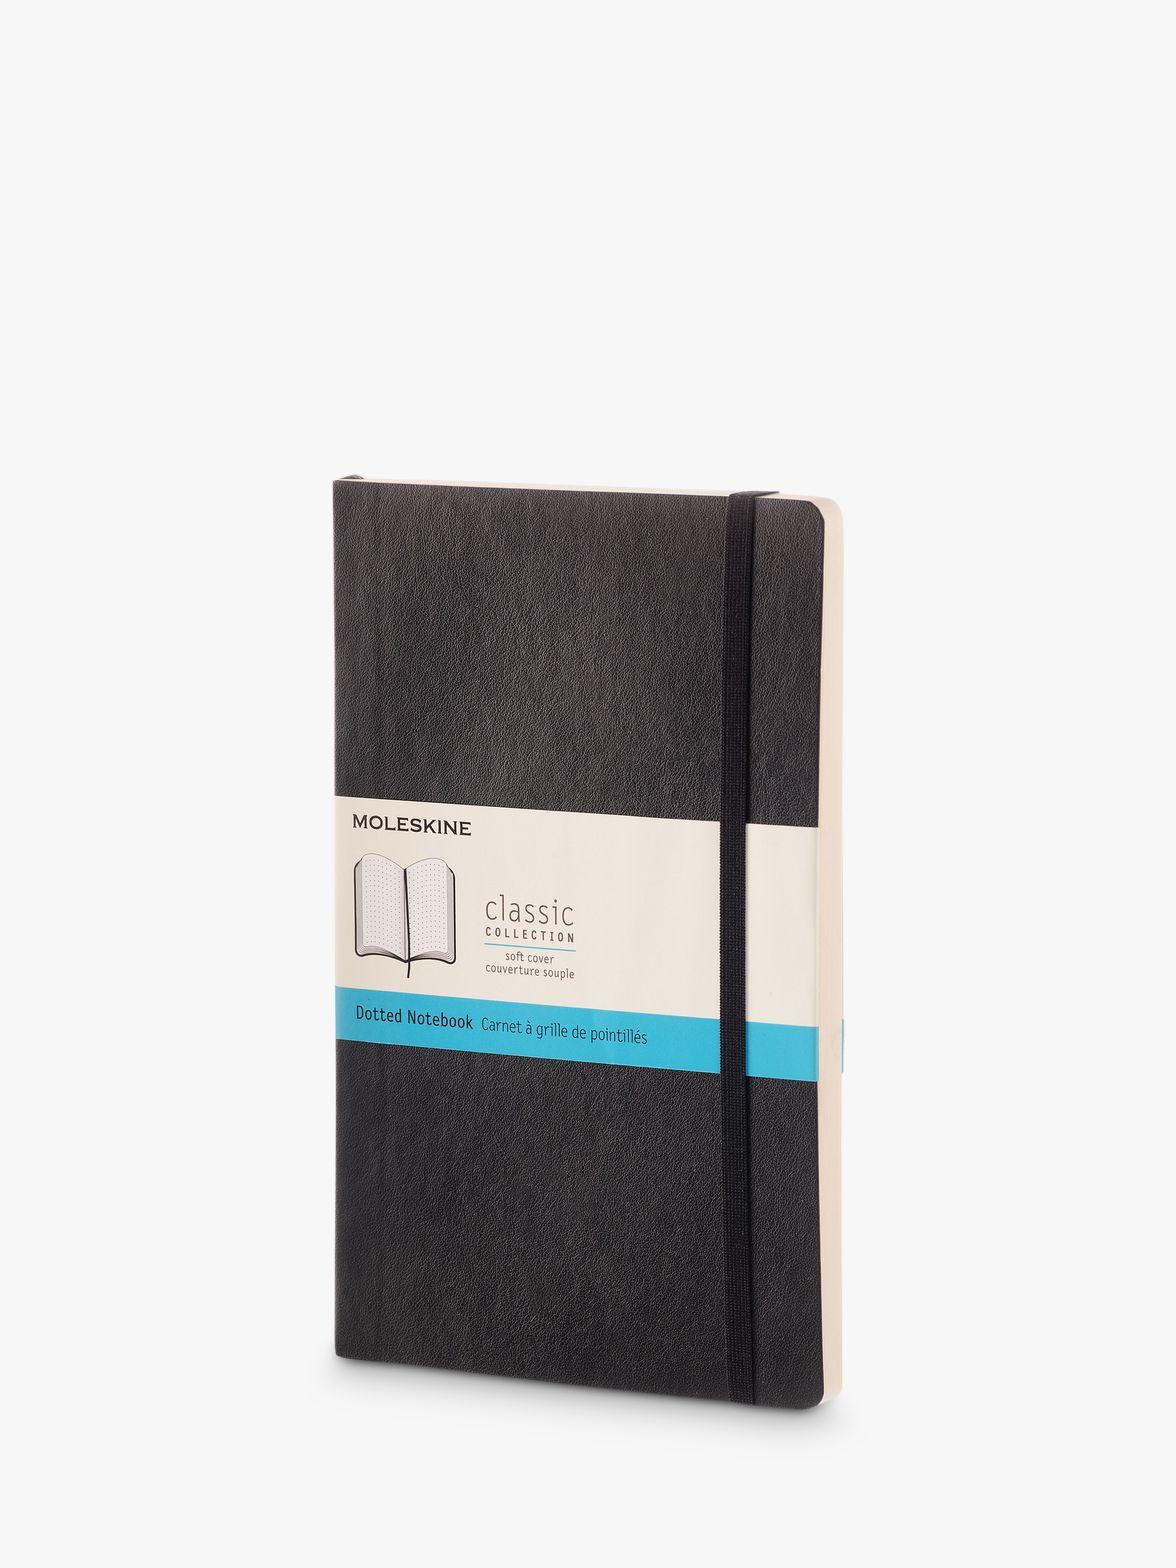 Moleskine Moleskine Large Soft Cover Dotted Notebook, Black